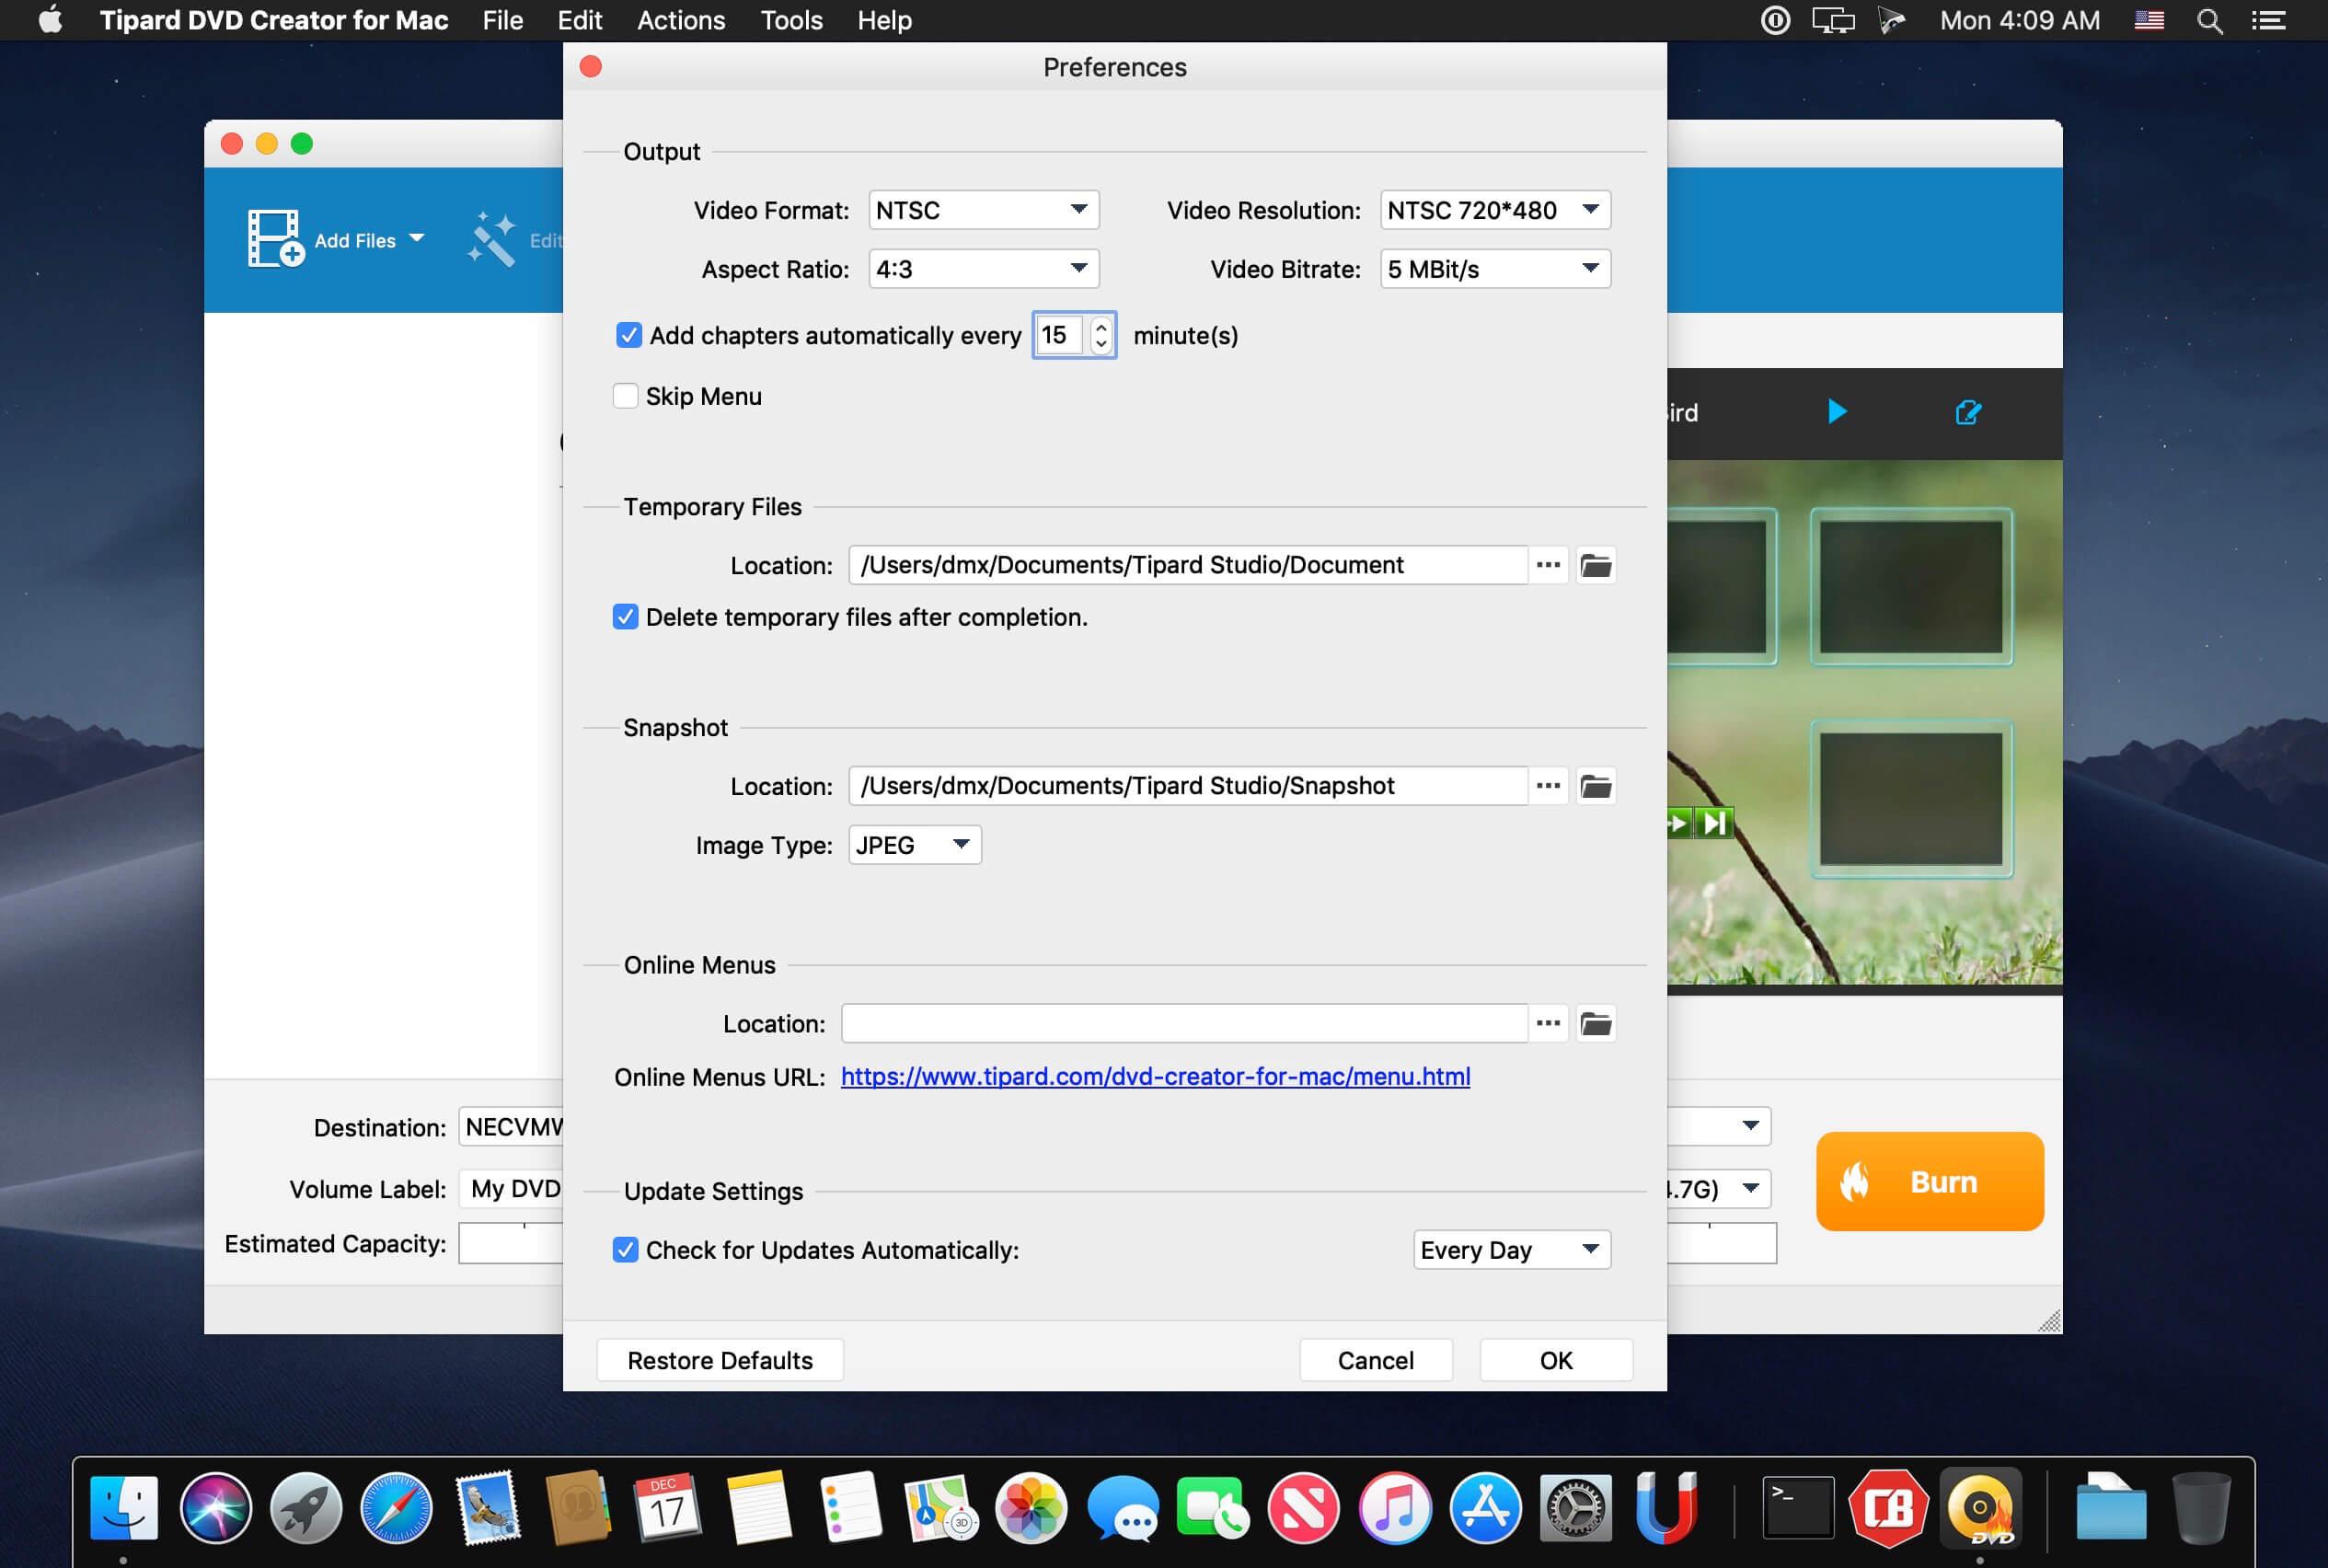 Tipard DVD Creator for Mac 3 2 10 download | macOS